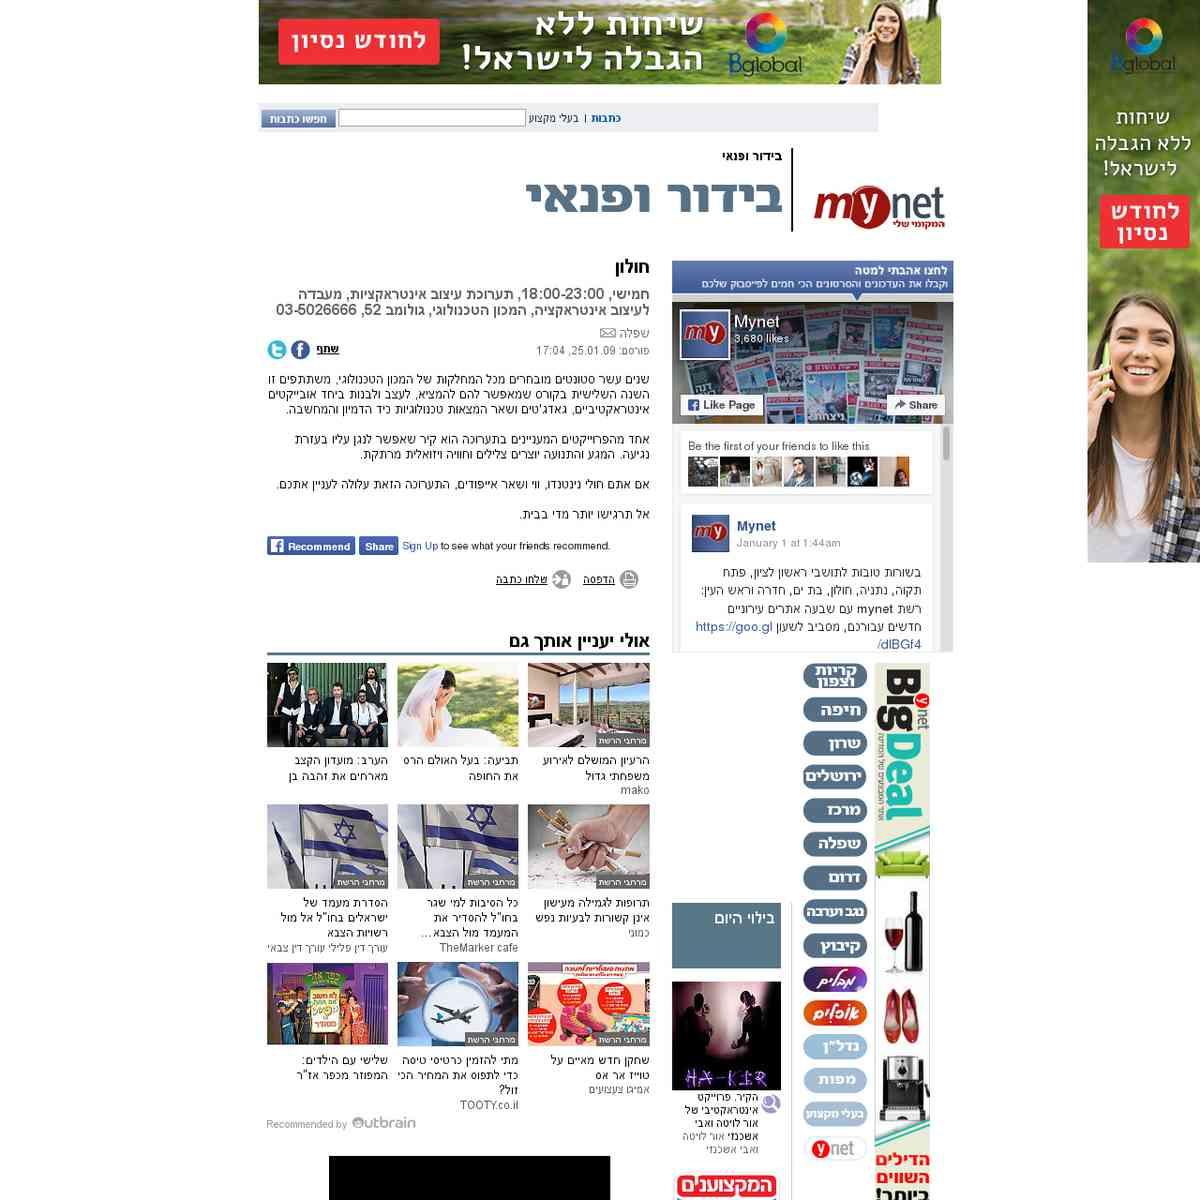 mynet.co.il/articles/0,7340,L-3661515,00.html